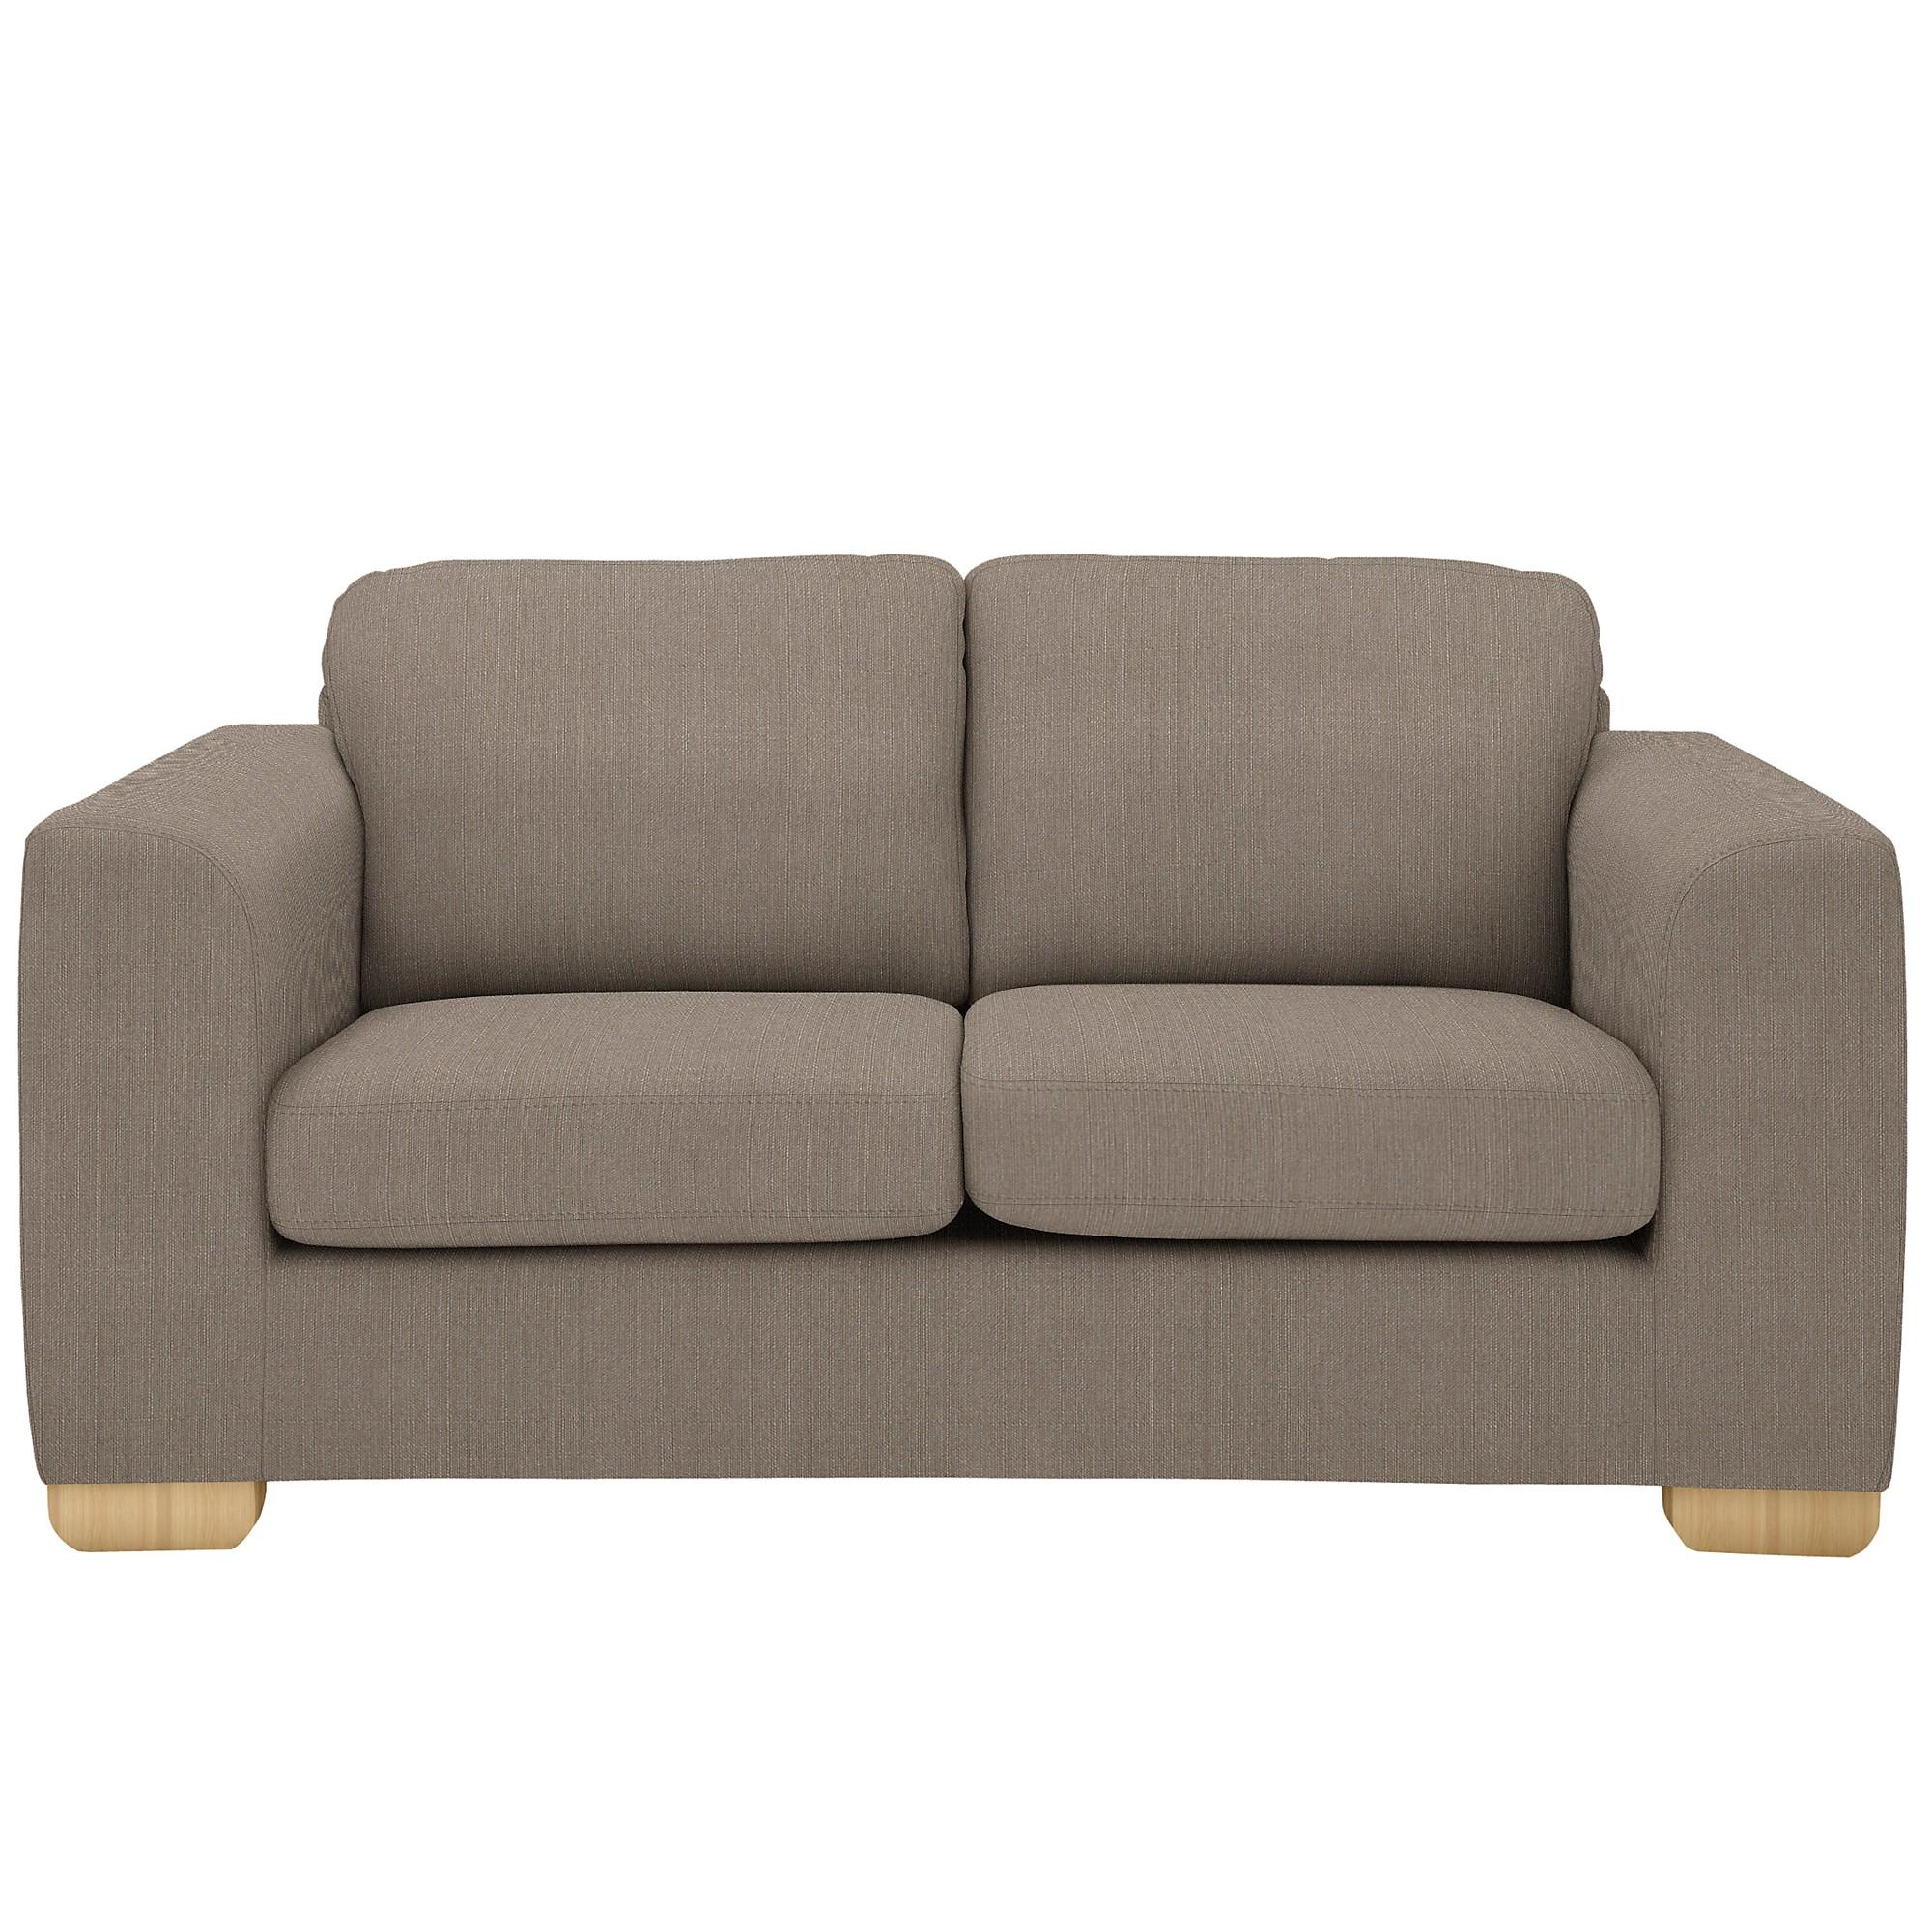 John Lewis Felix Small Sofa